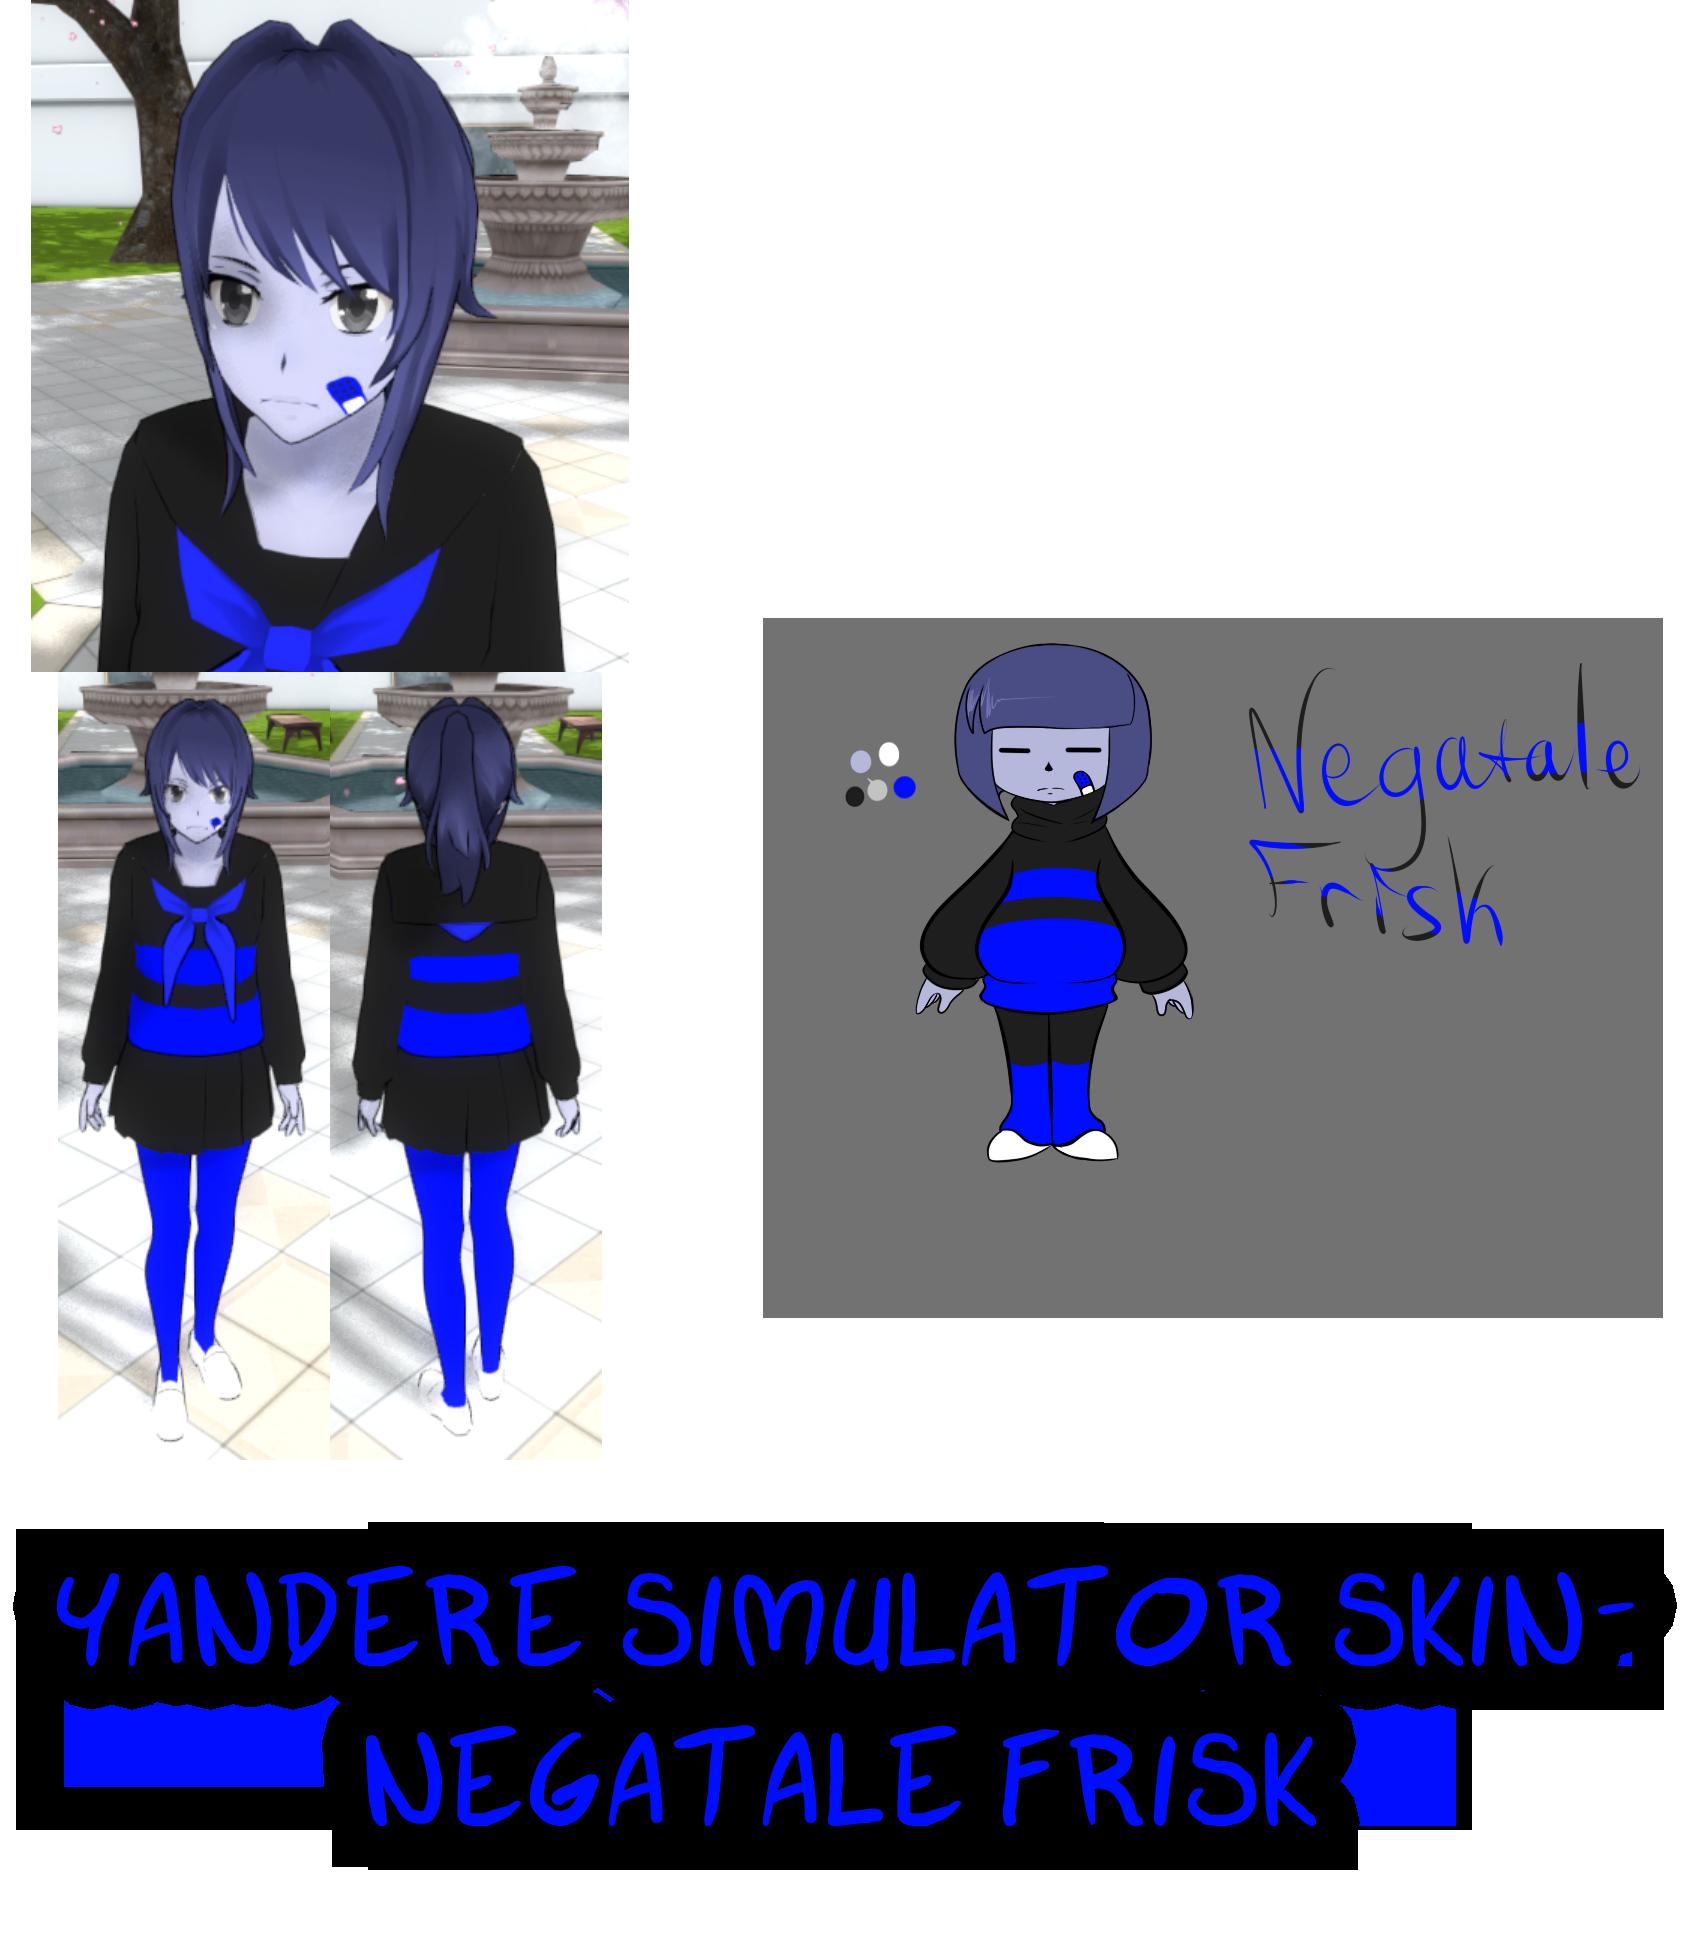 Yandere simulator negatale frisk. Skin clipart my body